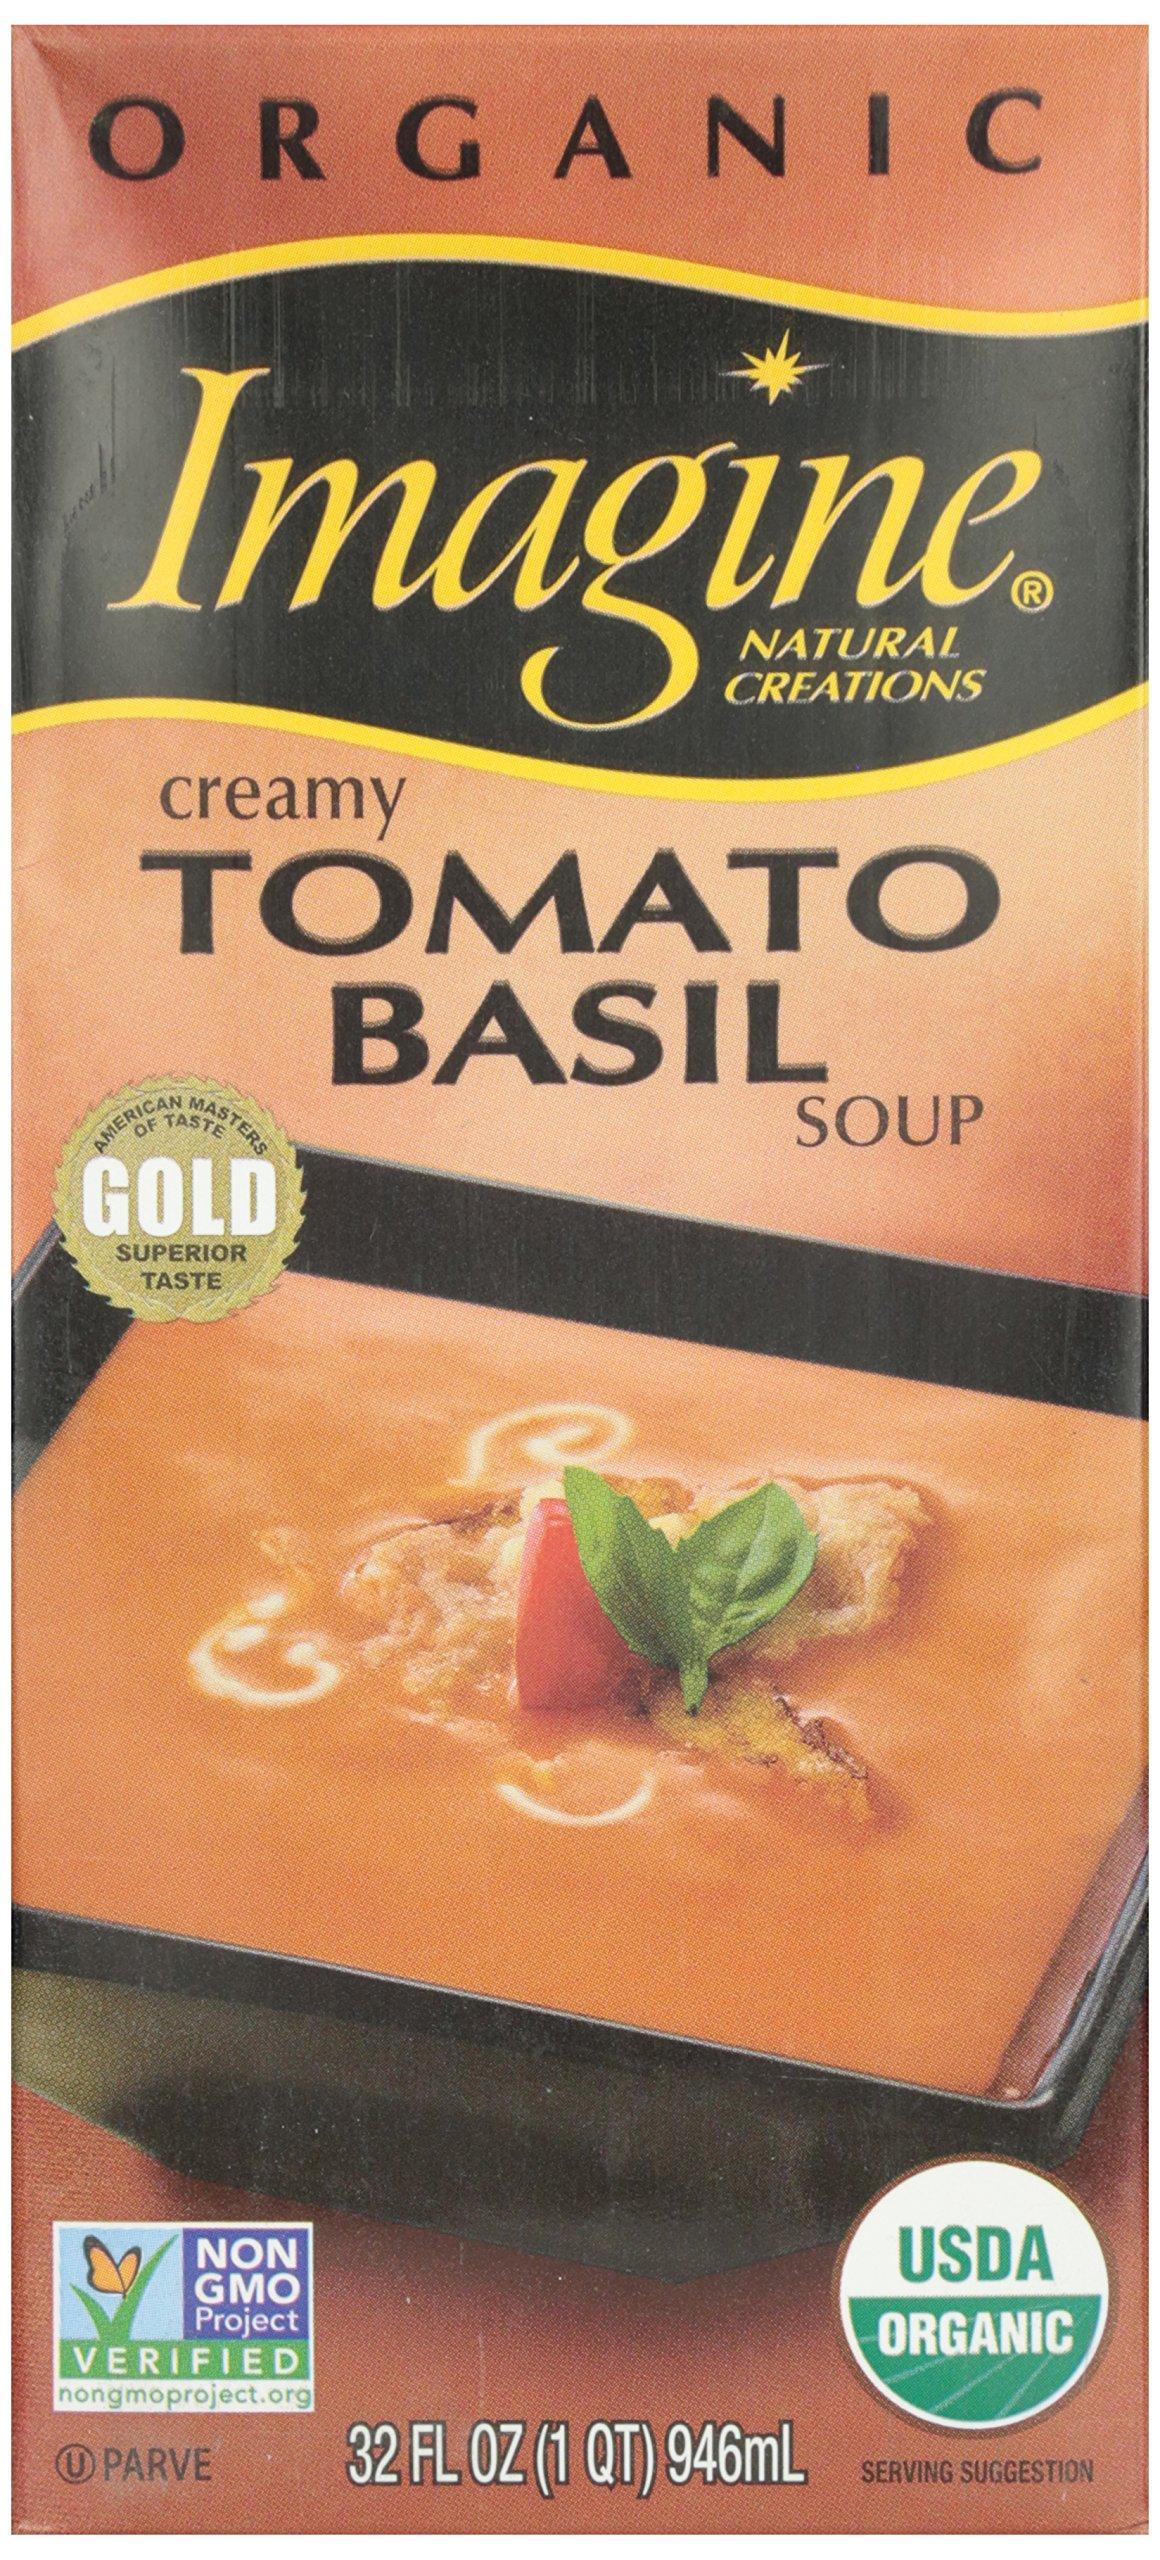 Imagine Creamy Tomato Basil Soup, Organic, 32 oz